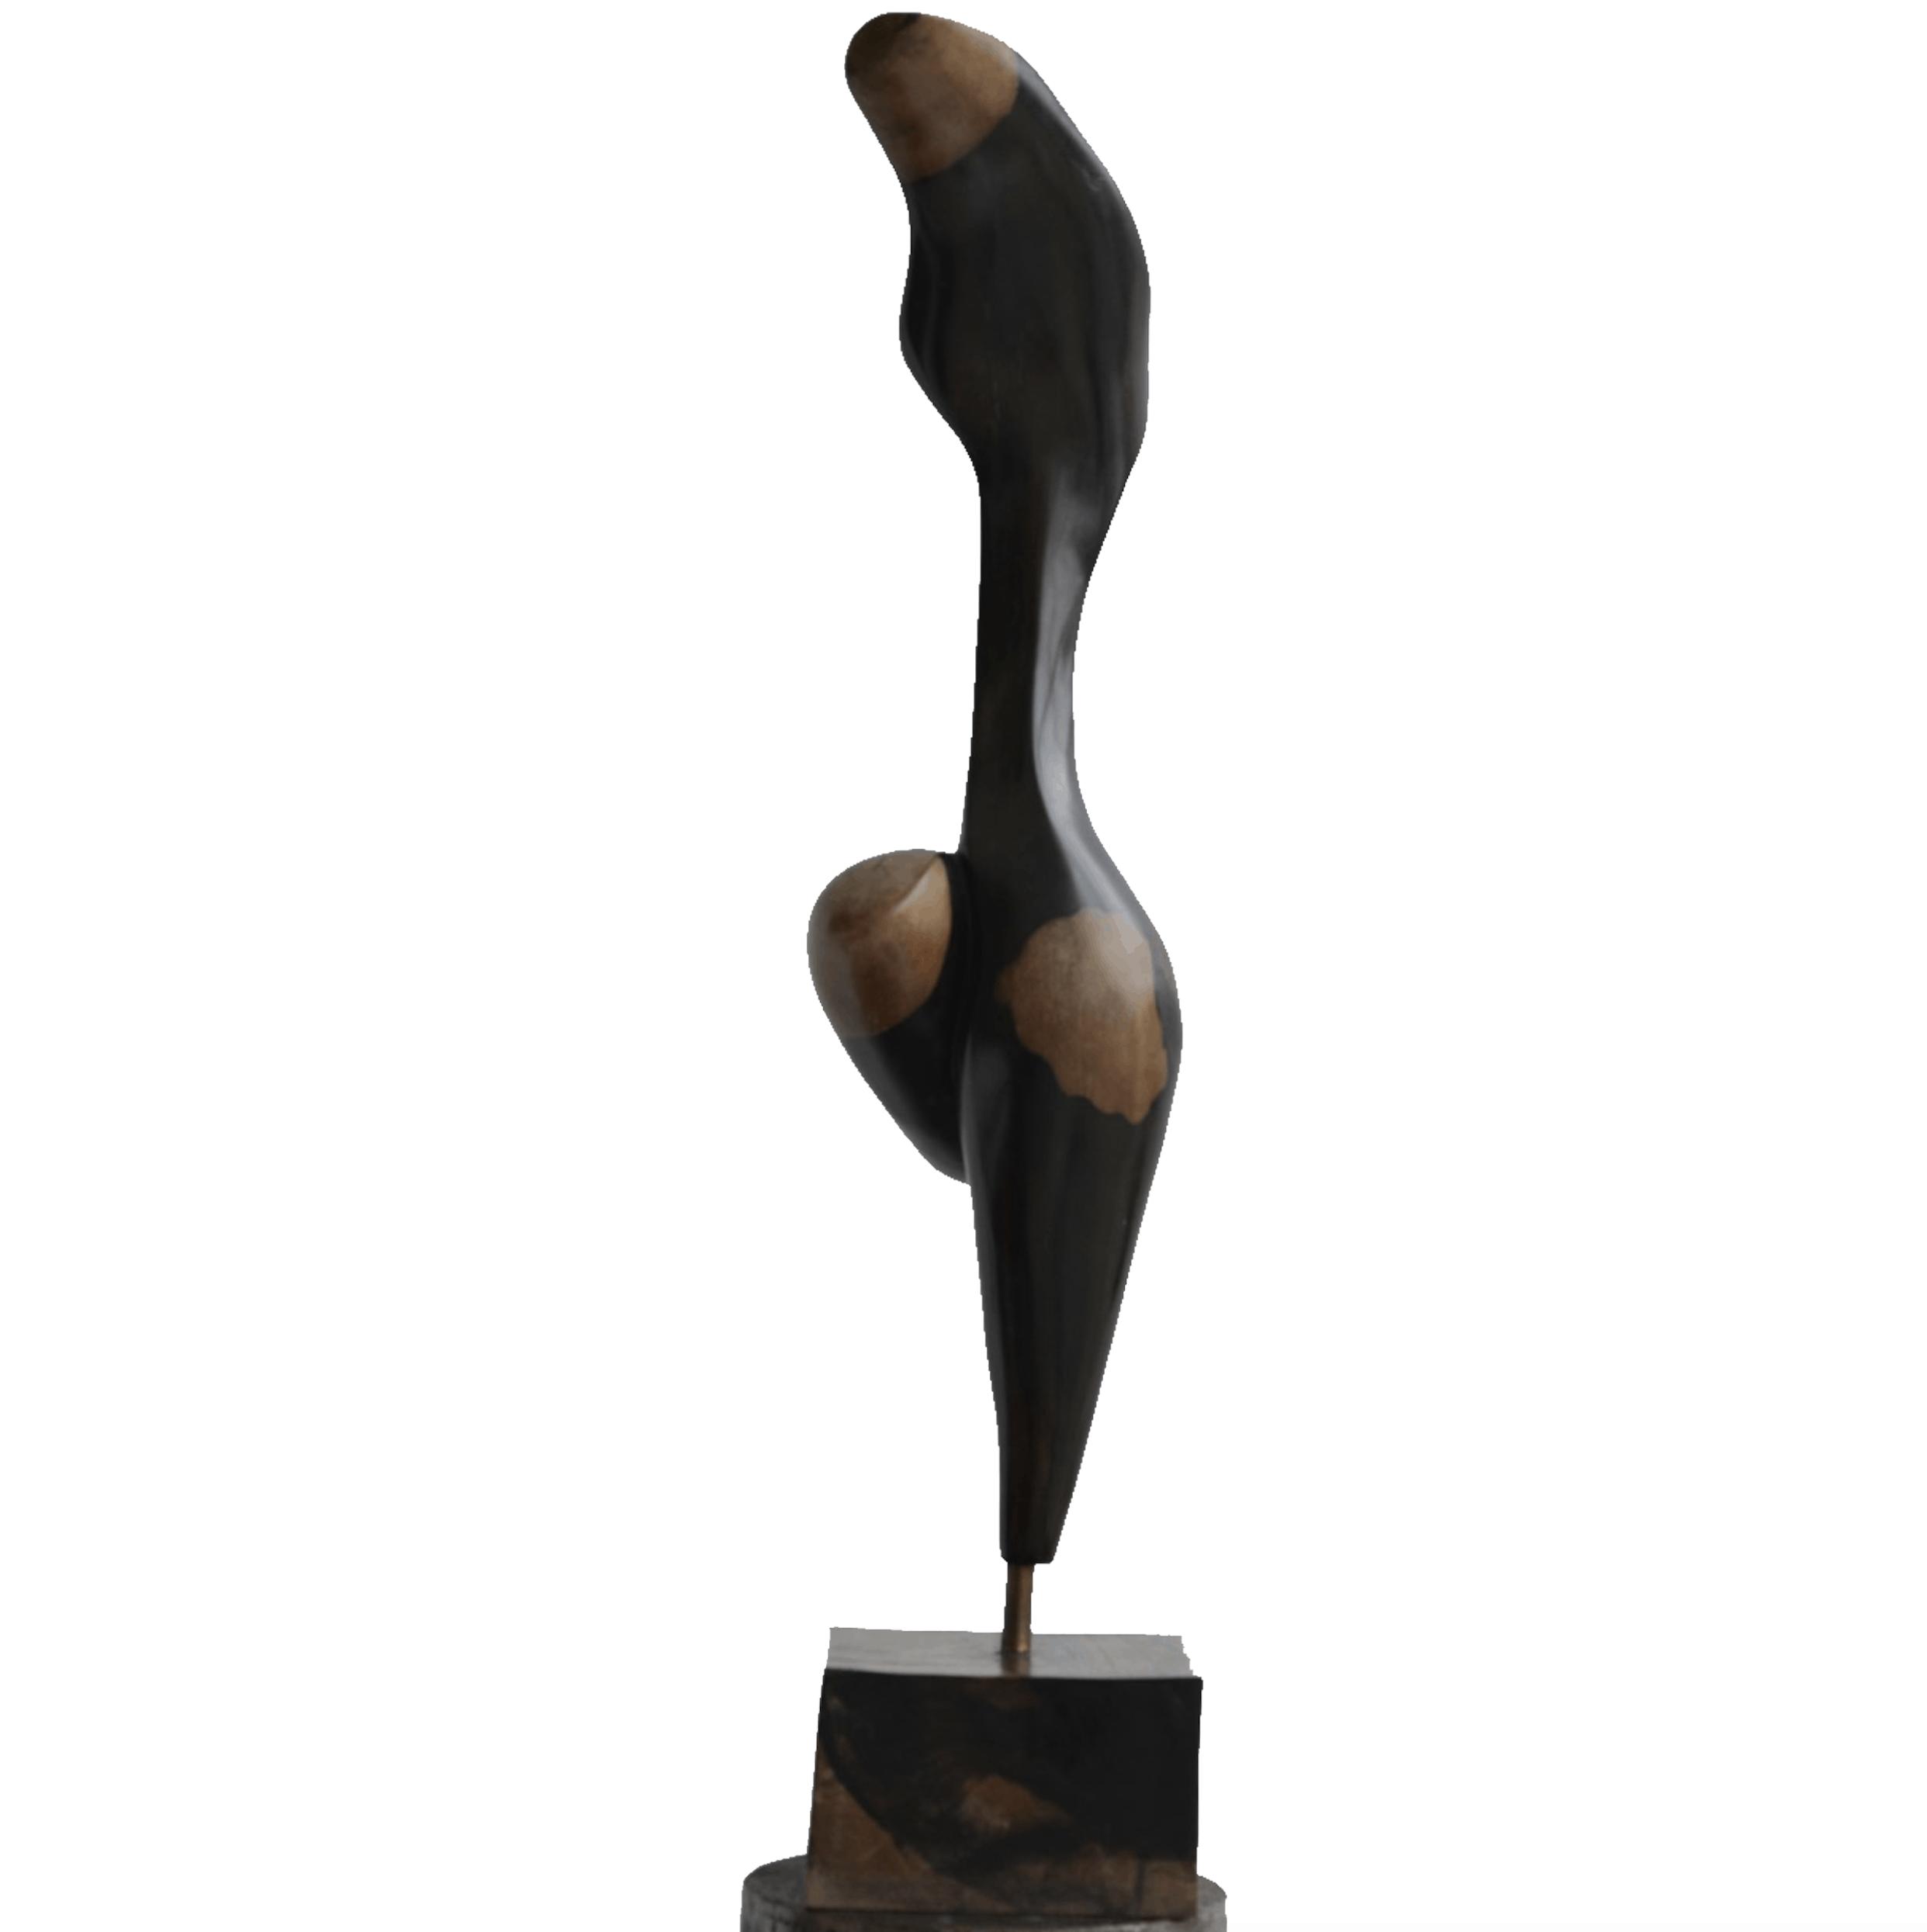 Boma Jeo Jim – Untitled (2012)